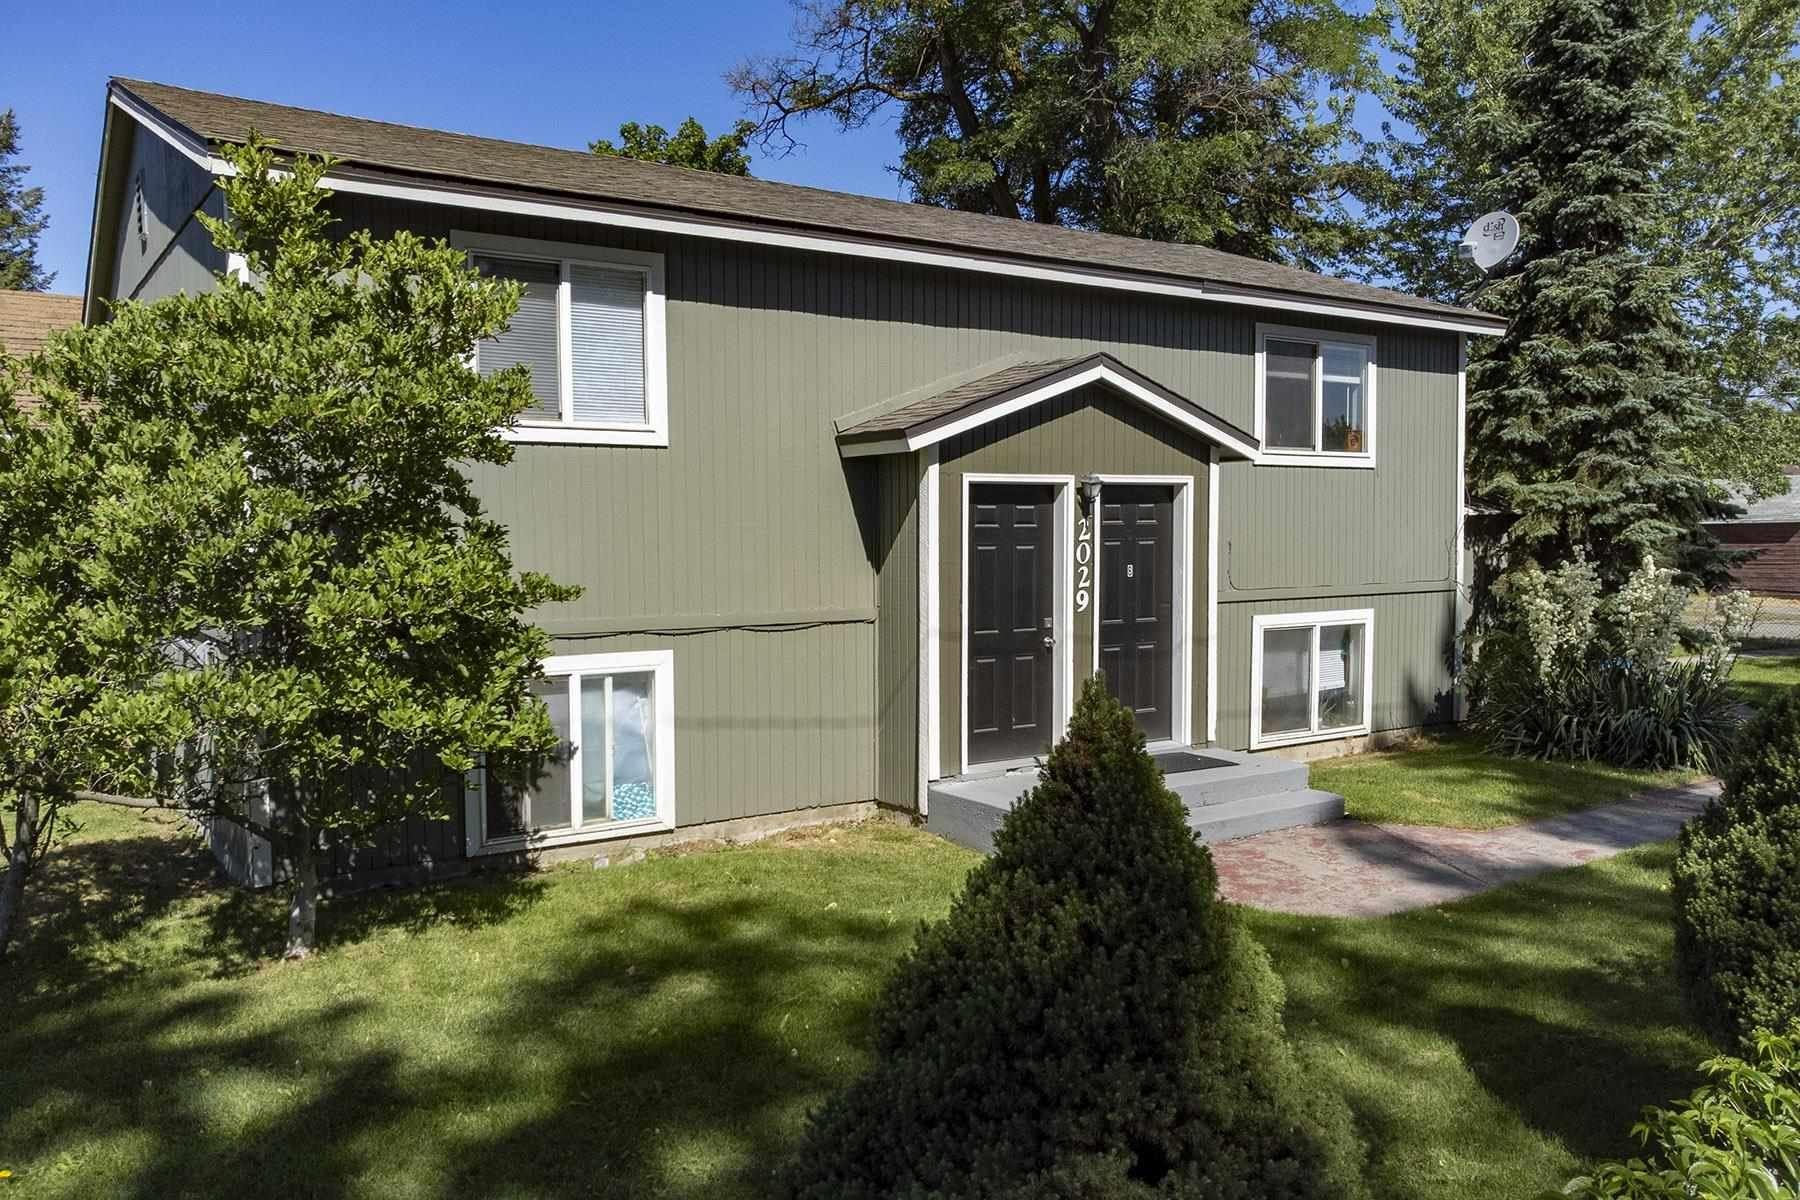 2029 E Pacific Ave, Spokane, WA 99202 - #: 202118732